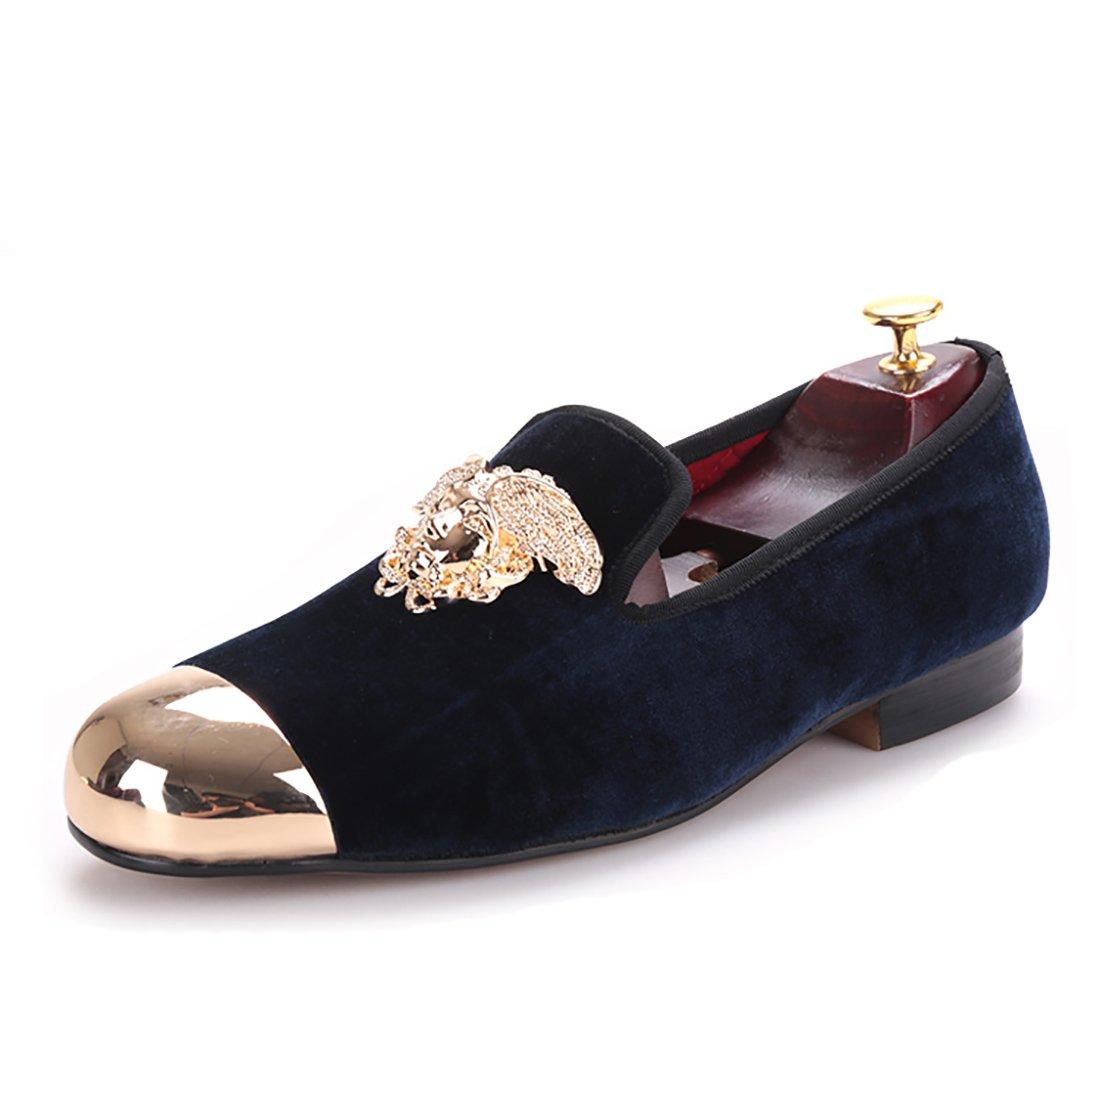 HI&HANN Men's Loafers Gold Top and Metal Toe Men Velvet Casual Shoes Smoking Slipper-7.5-Navyblue